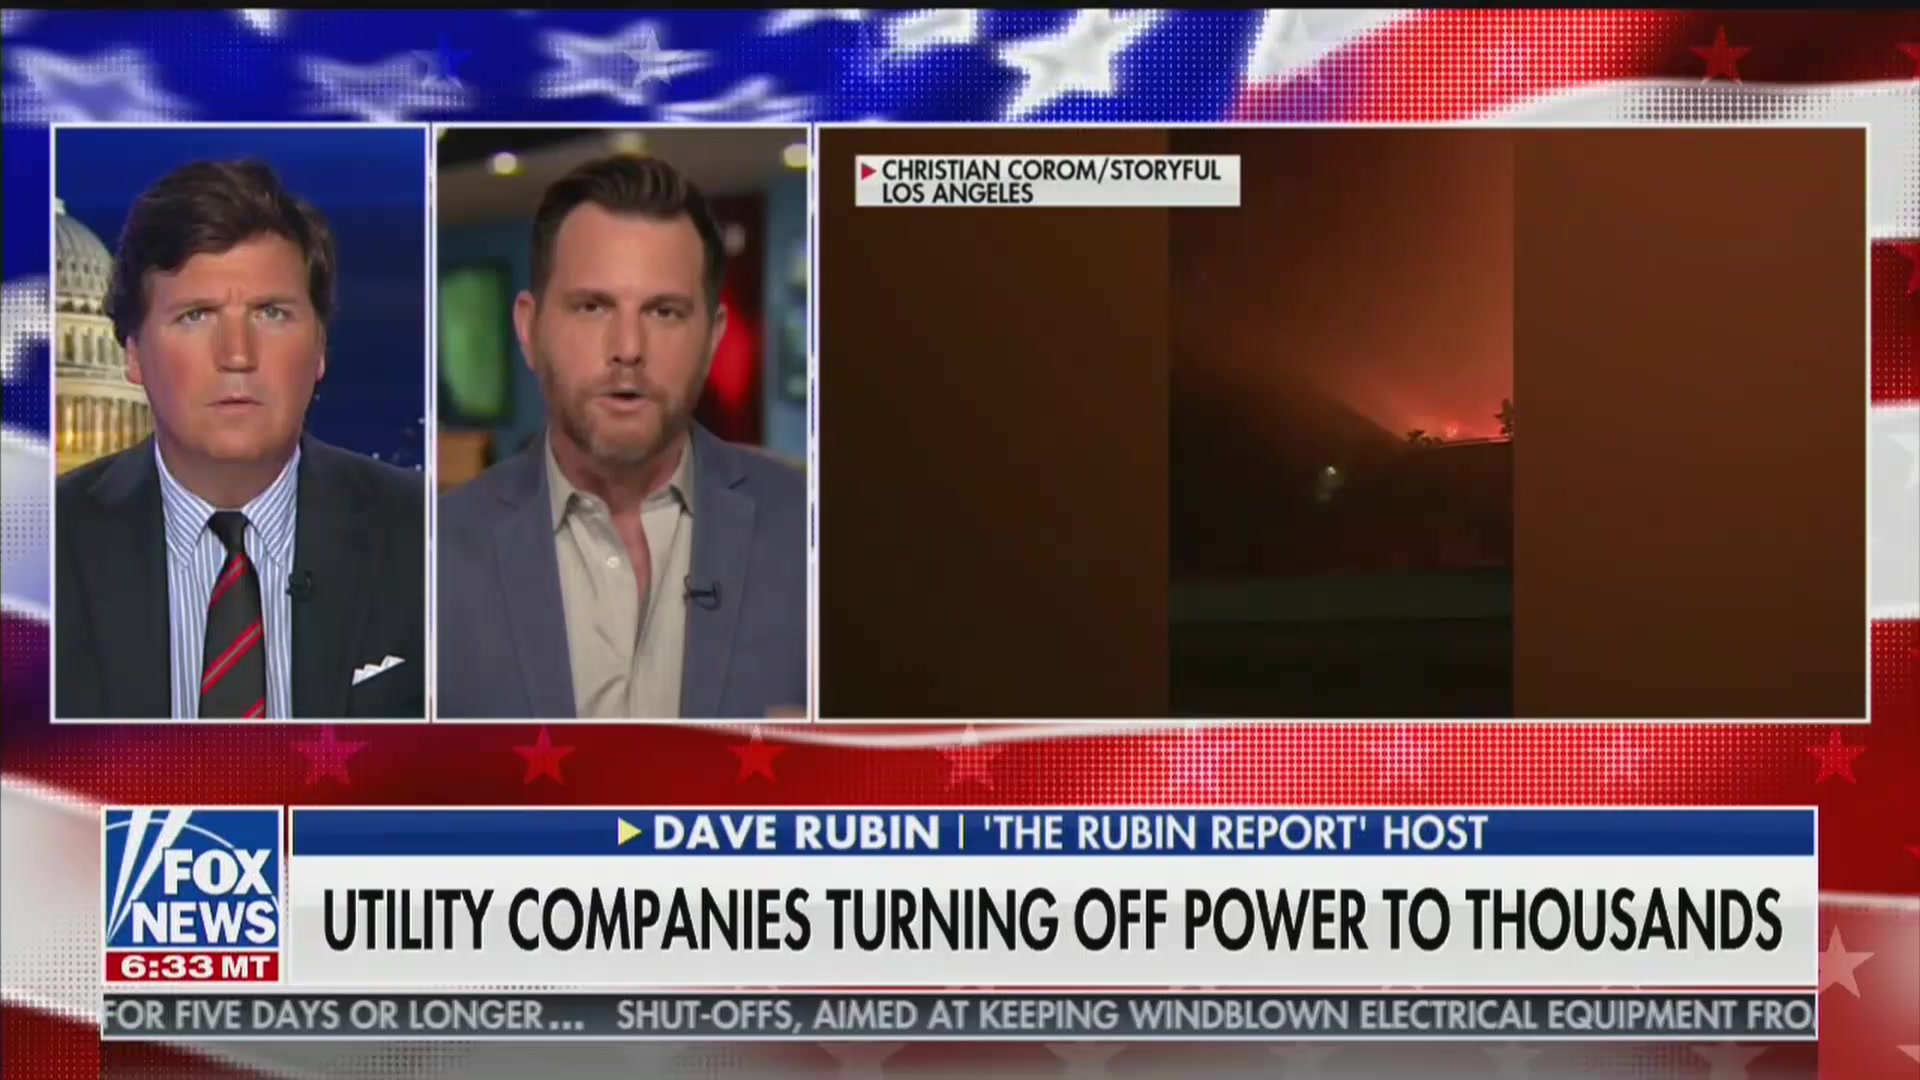 Tucker Carlson, Dave Rubin Claim 'Woke' Culture Is to Blame for California Fires